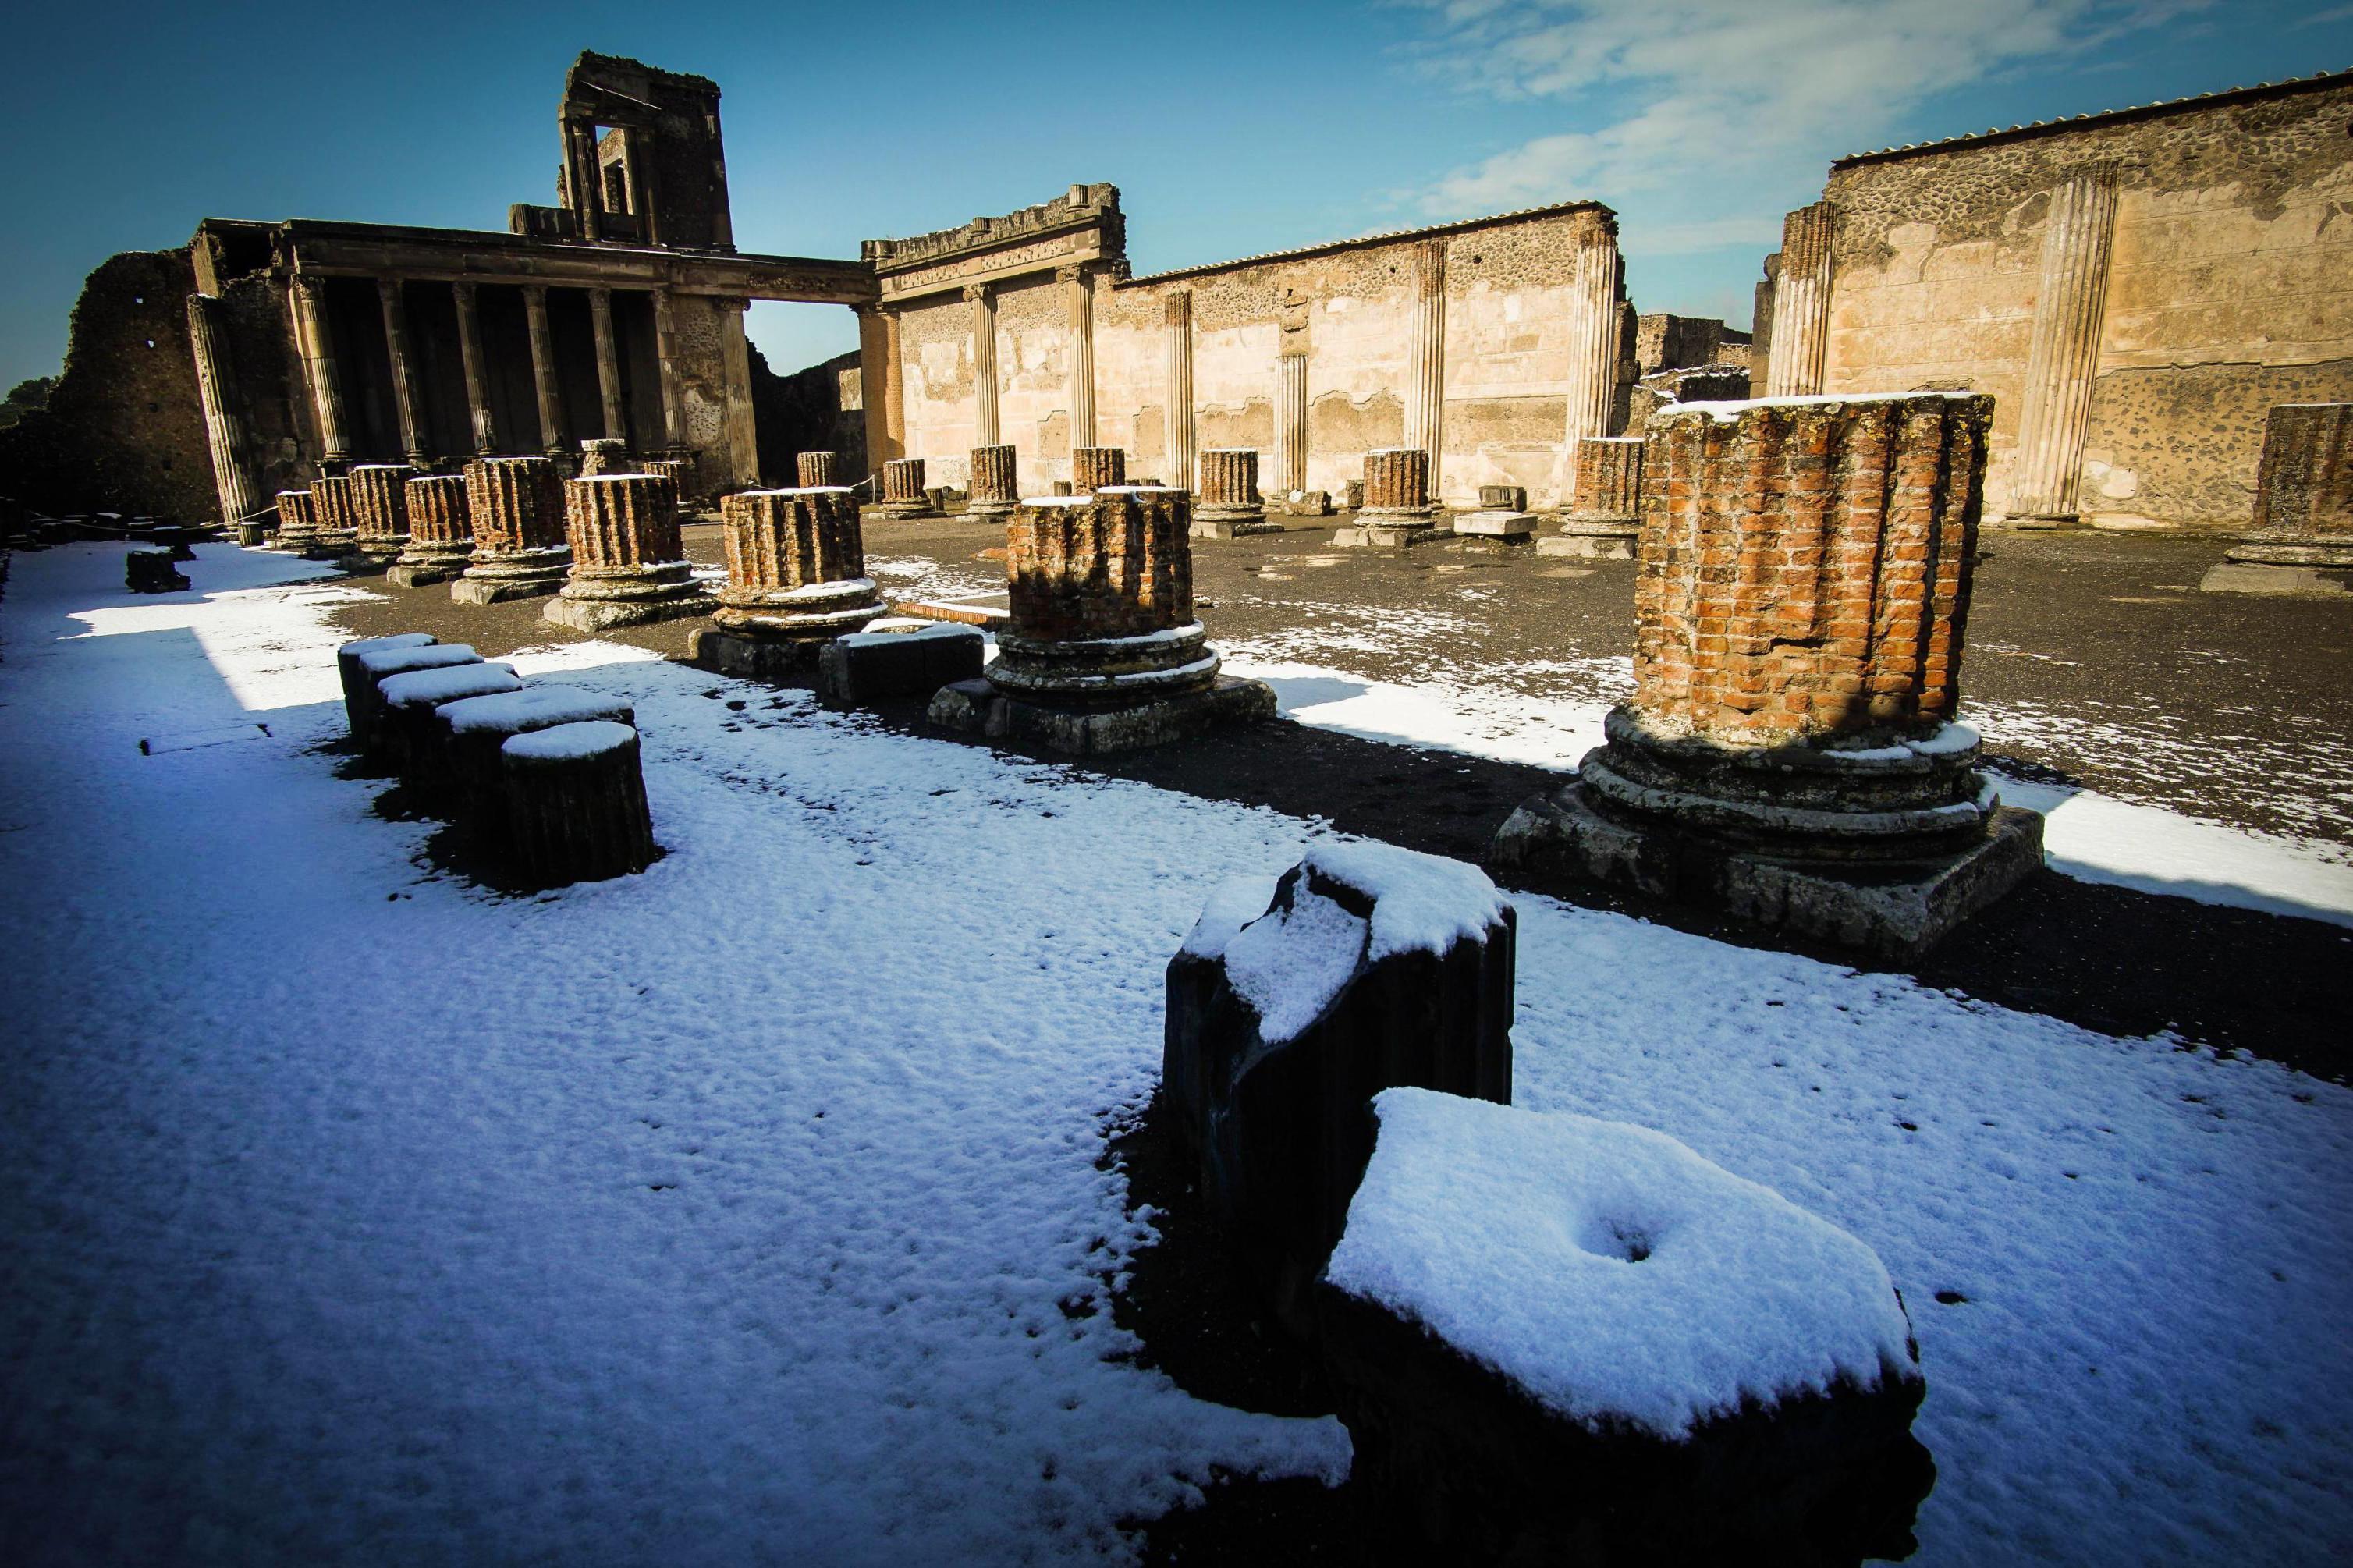 Las ruinas de Pompeya (Cesare Abbate/ANSA via AP)